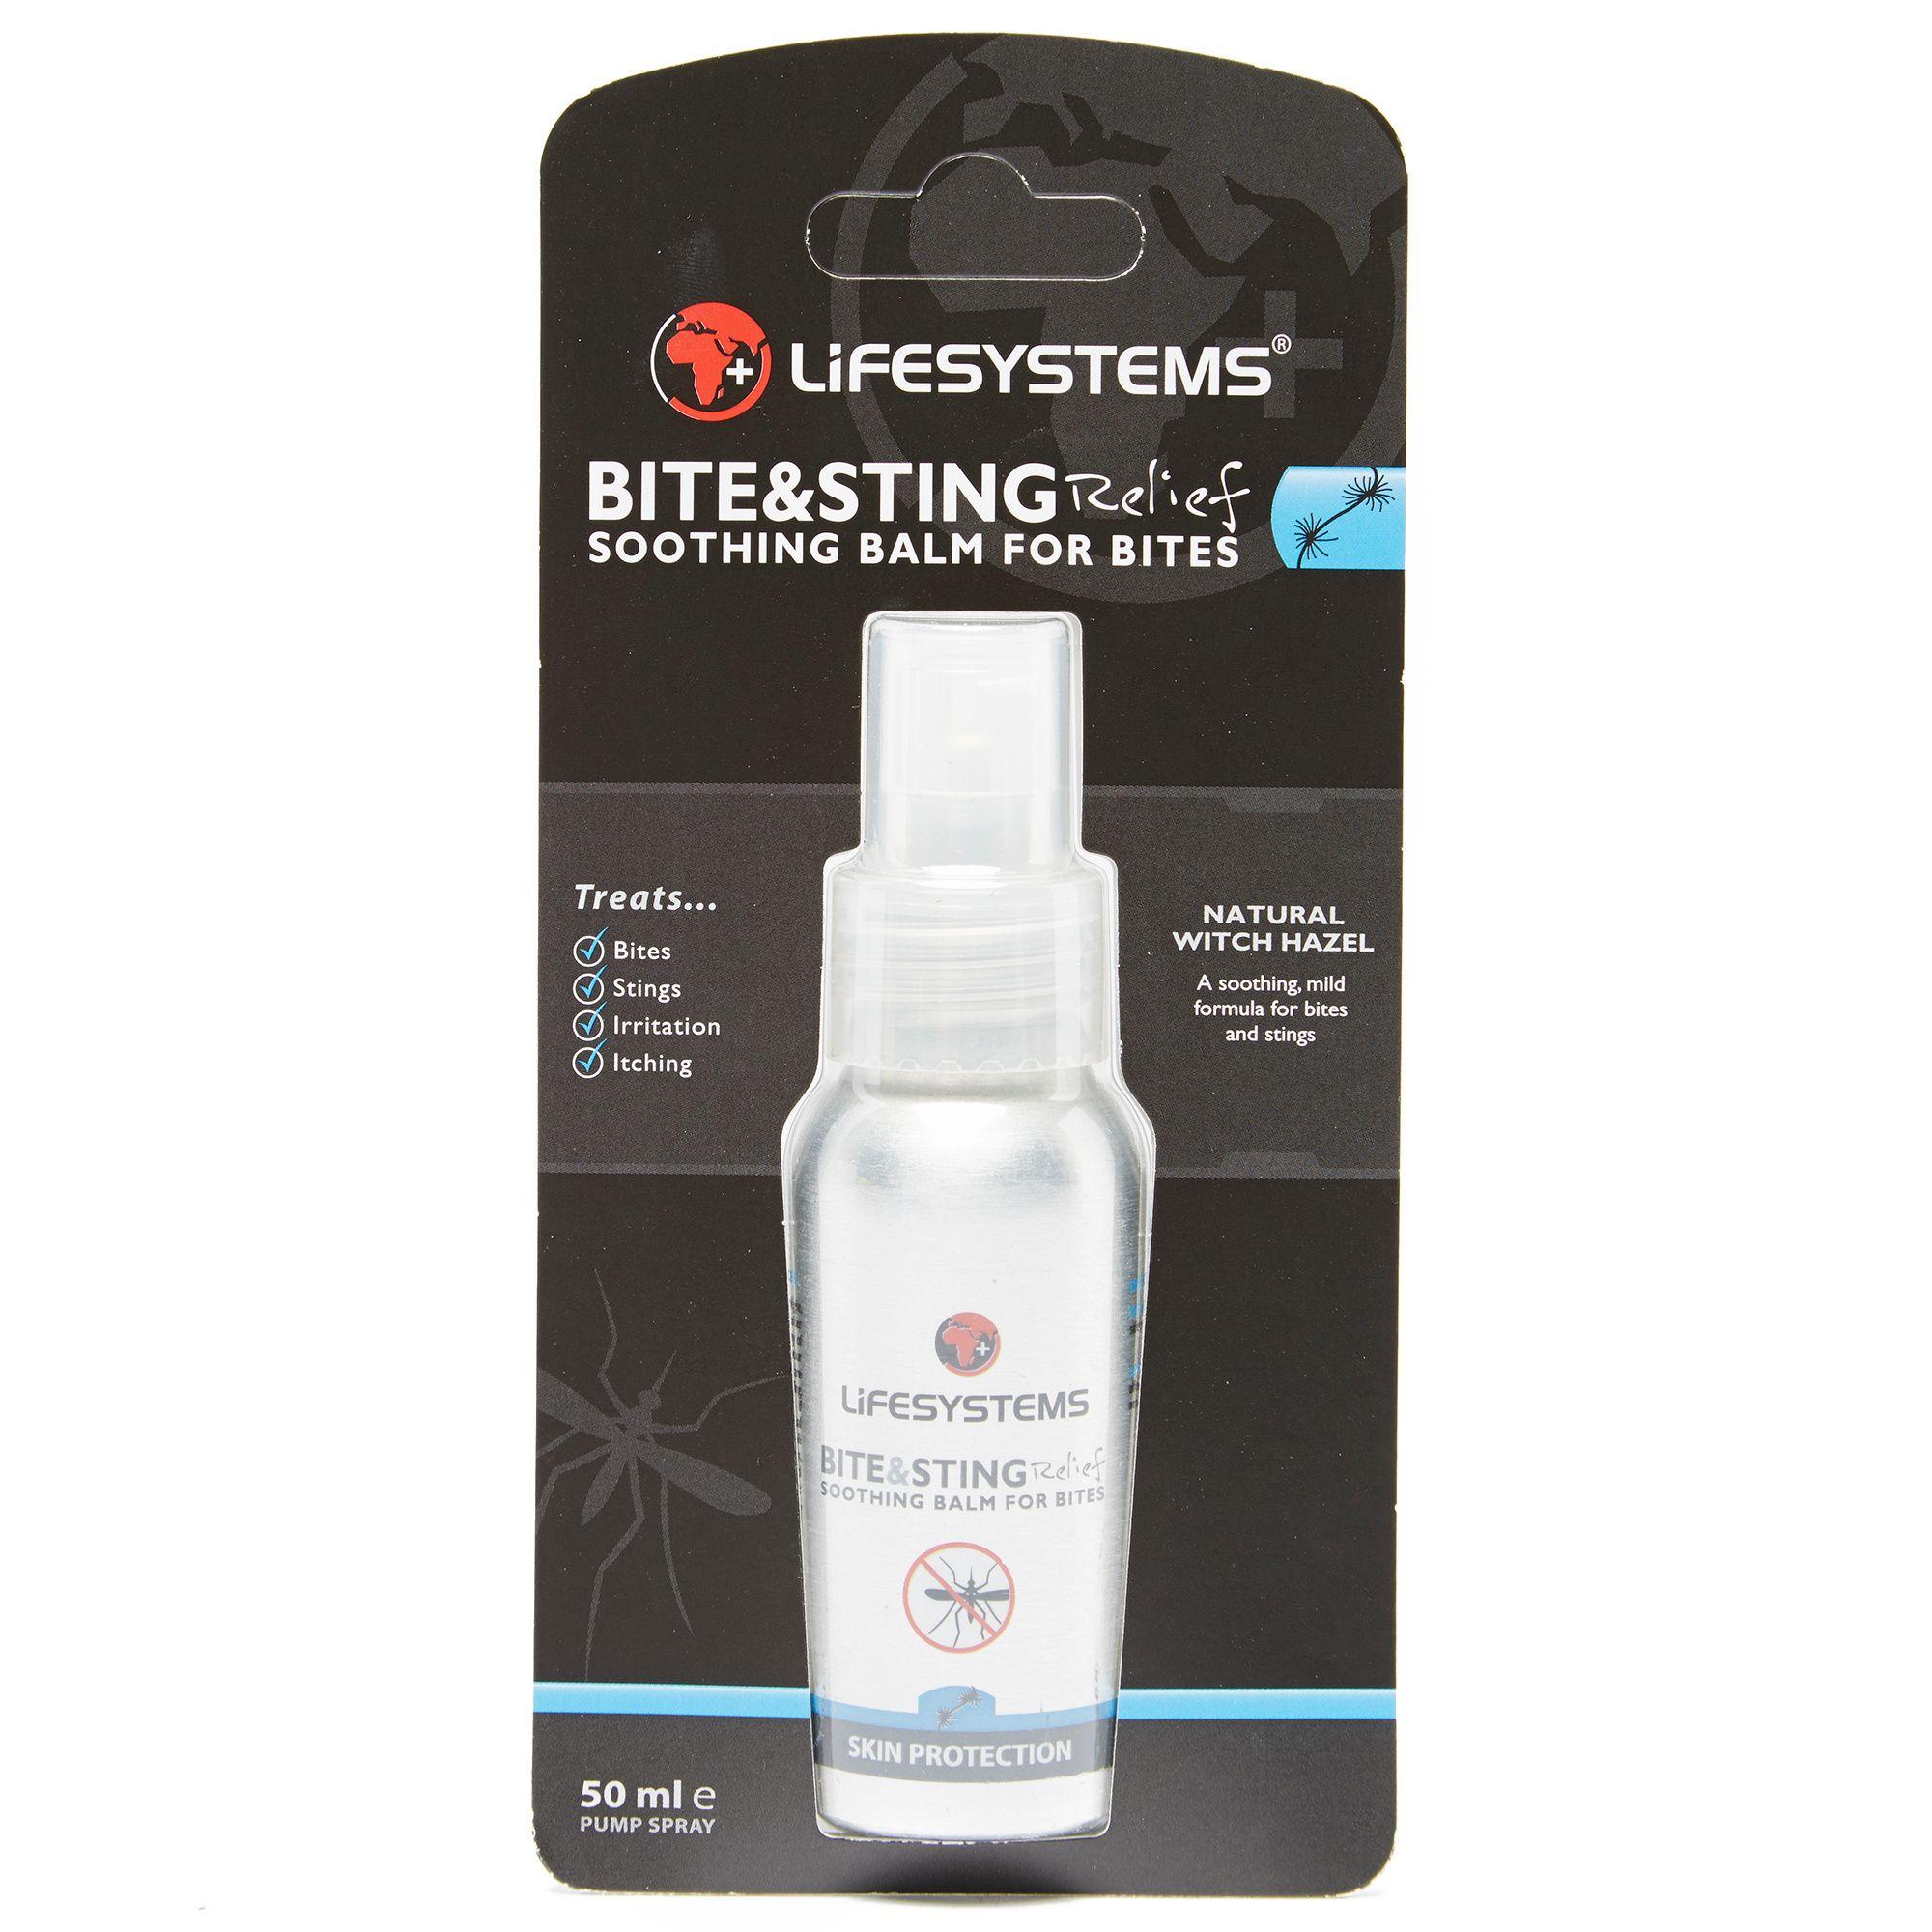 LIFESYSTEMS Bite & Sting Relief Spray